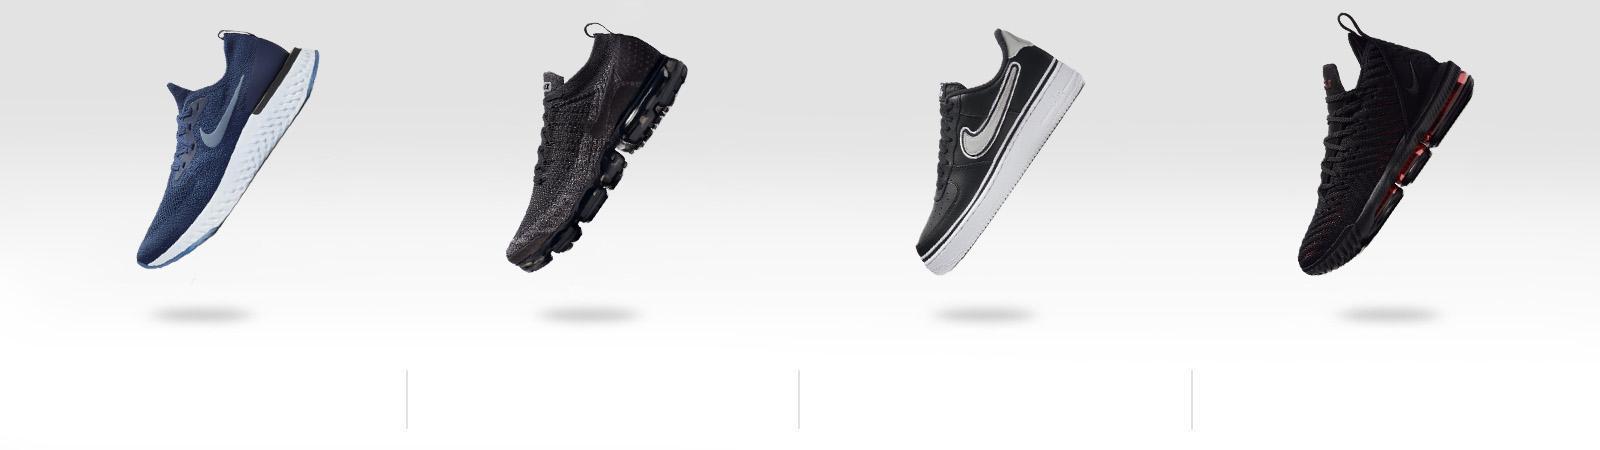 67d548acfdc coupon lebron 13 low silver h009mnbskt178 6d878 74eb2  new zealand mens  shoes nike hk official site. nike fb351 47fd3